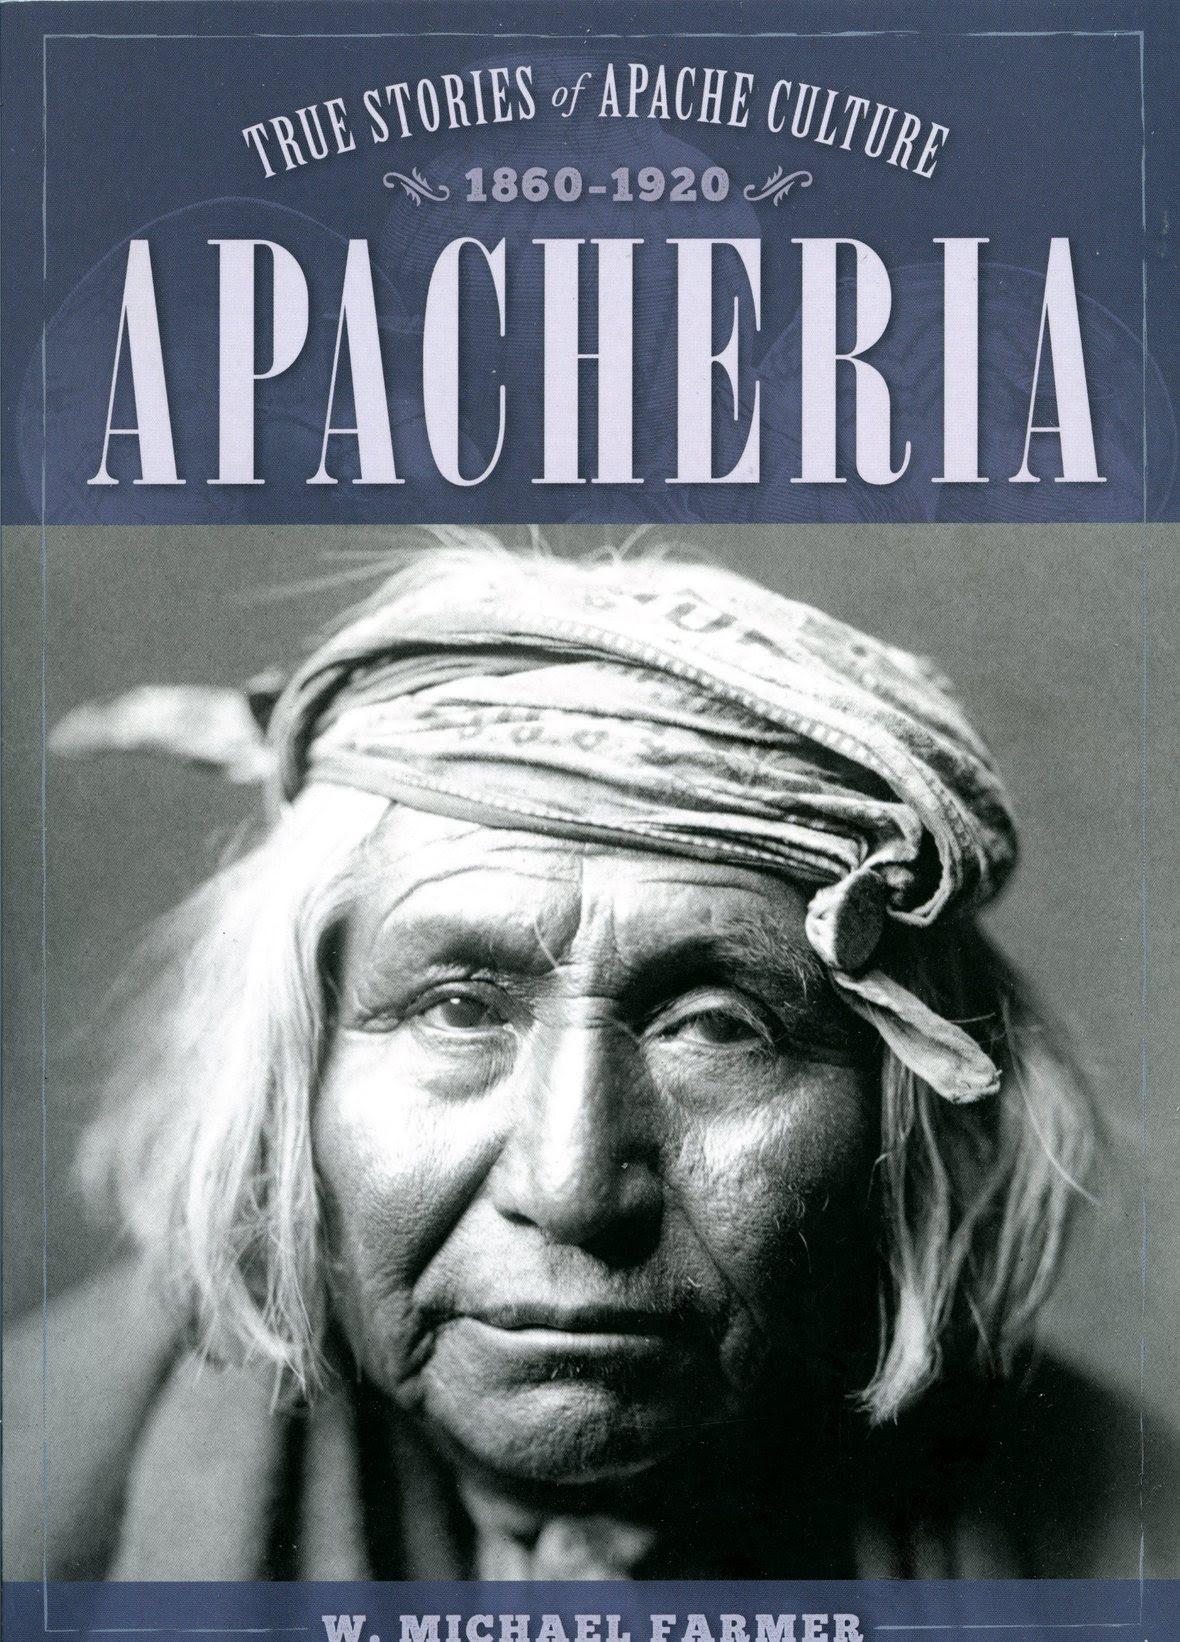 Farmer-Apacheria086